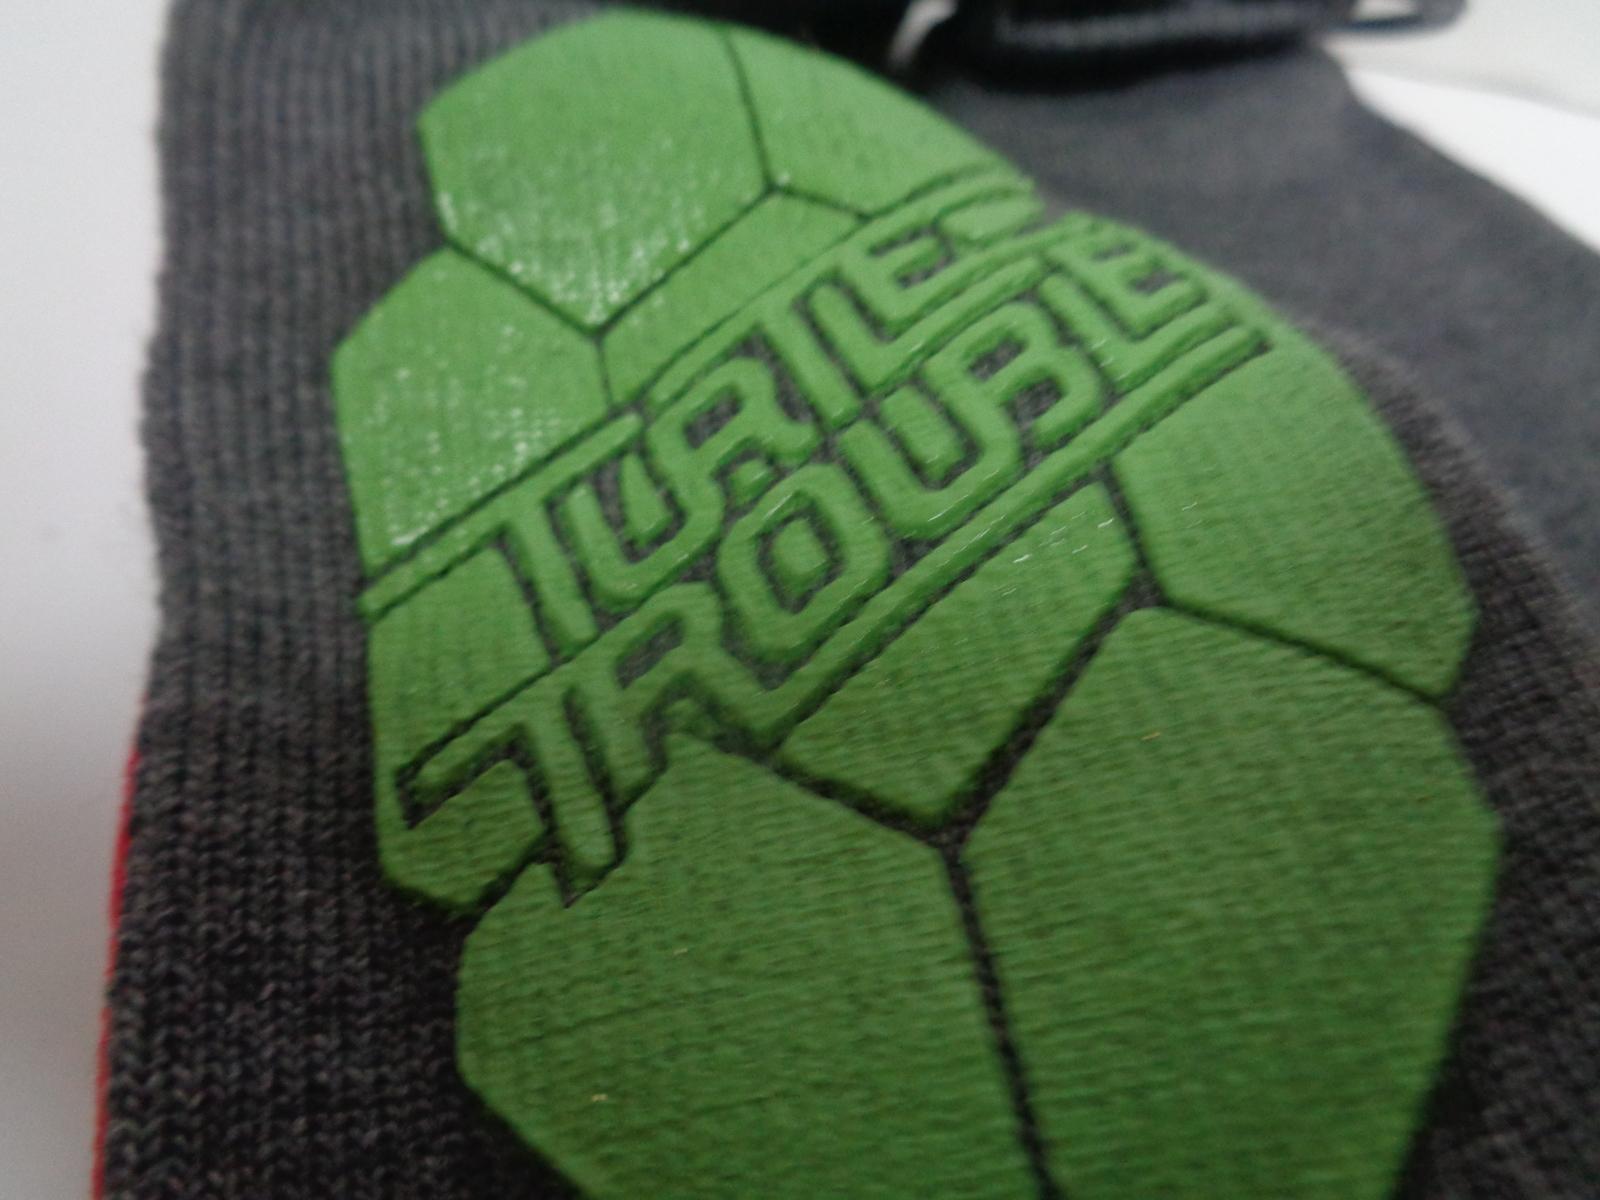 Ninja Turtle Slipper Socks NWT Size S/M 7-8 Nickelodeon Free Shipping